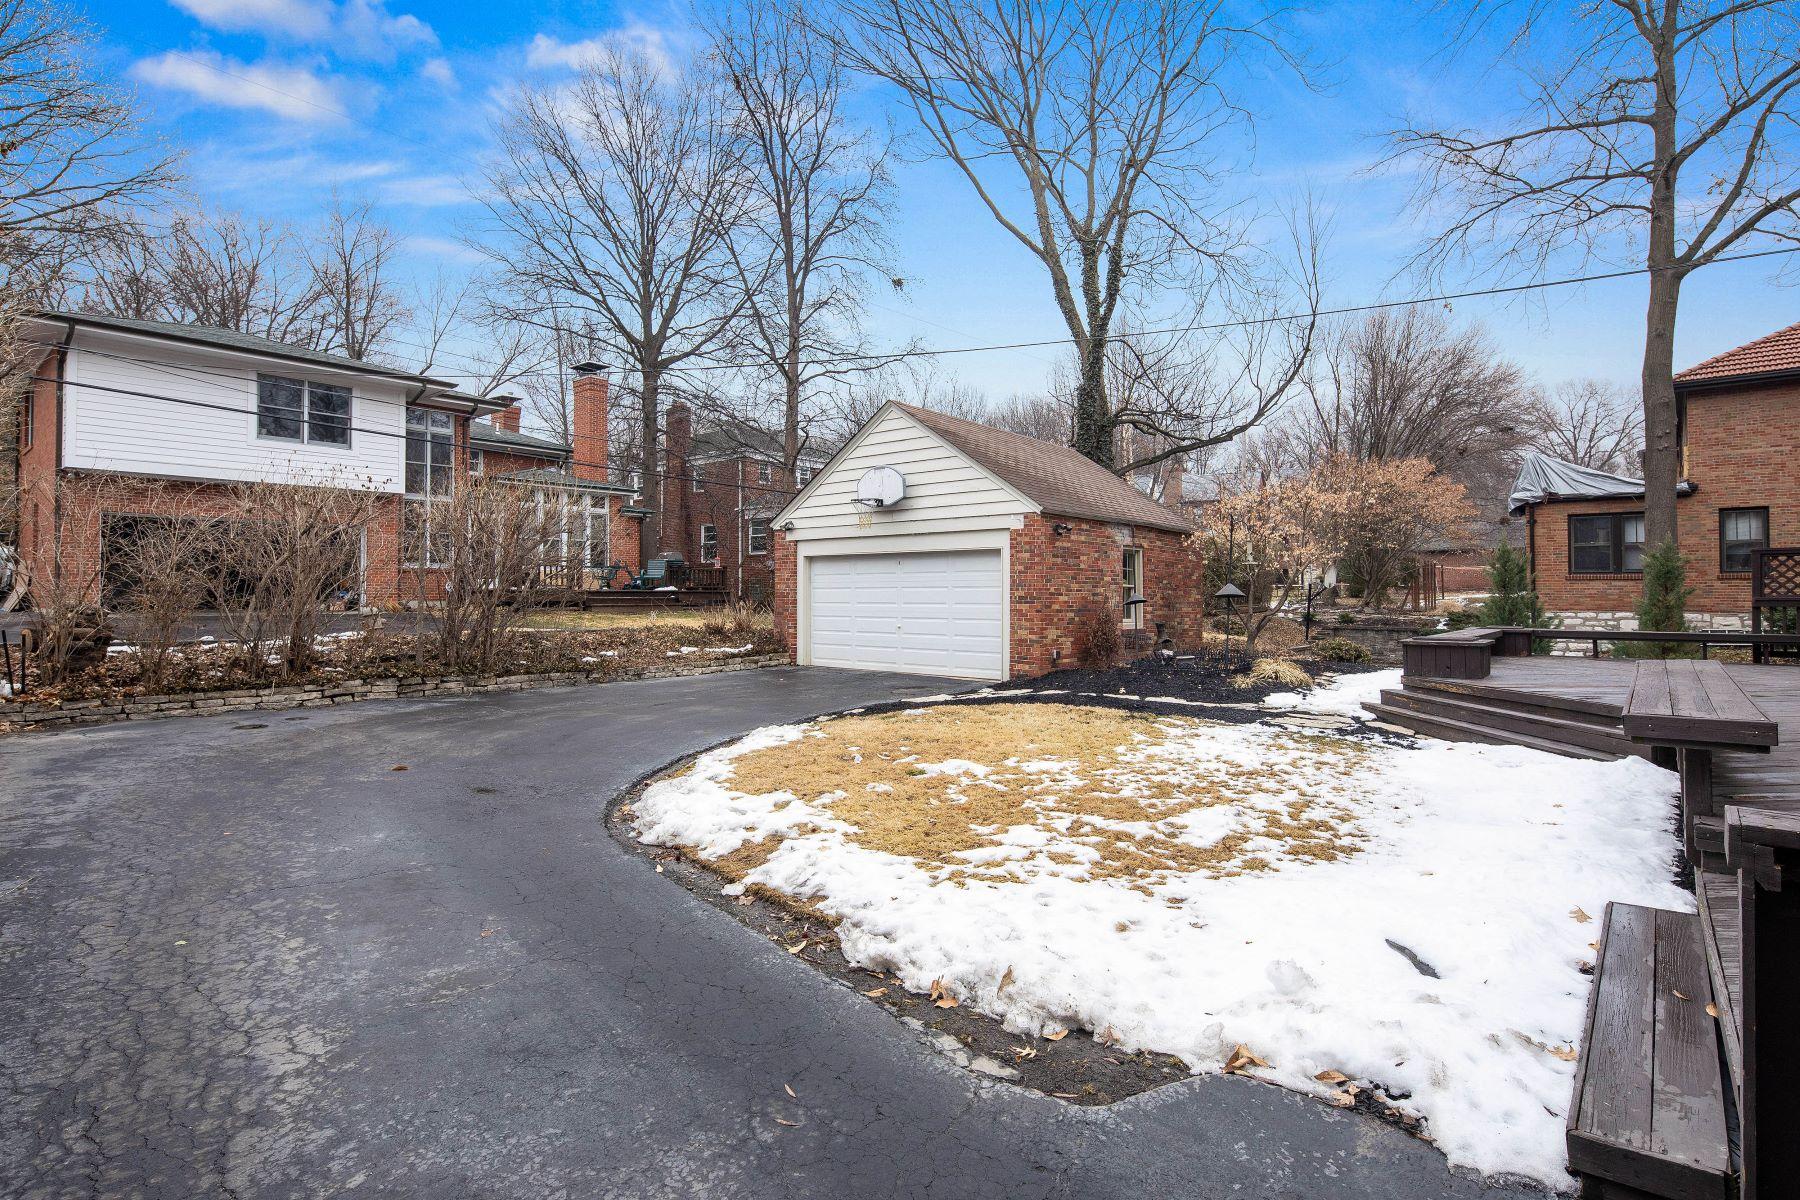 Additional photo for property listing at 7431 York Drive, Clayton, MO 63105 7431 York Drive Clayton, Missouri 63105 United States